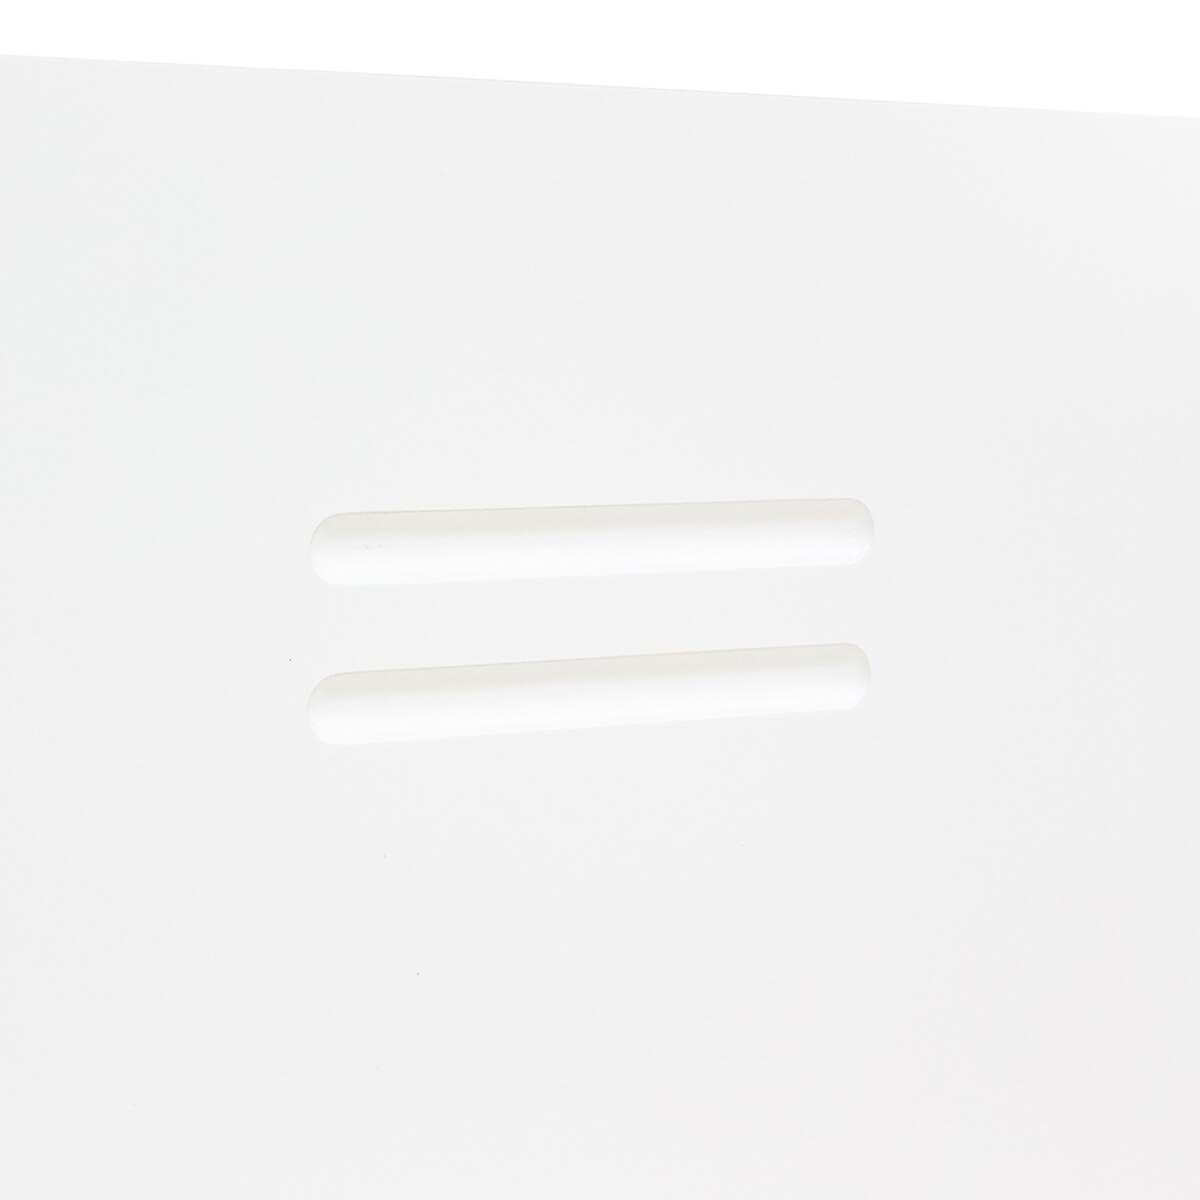 Cuna evolutiva 70x140cm LOCKER Bopita blanco